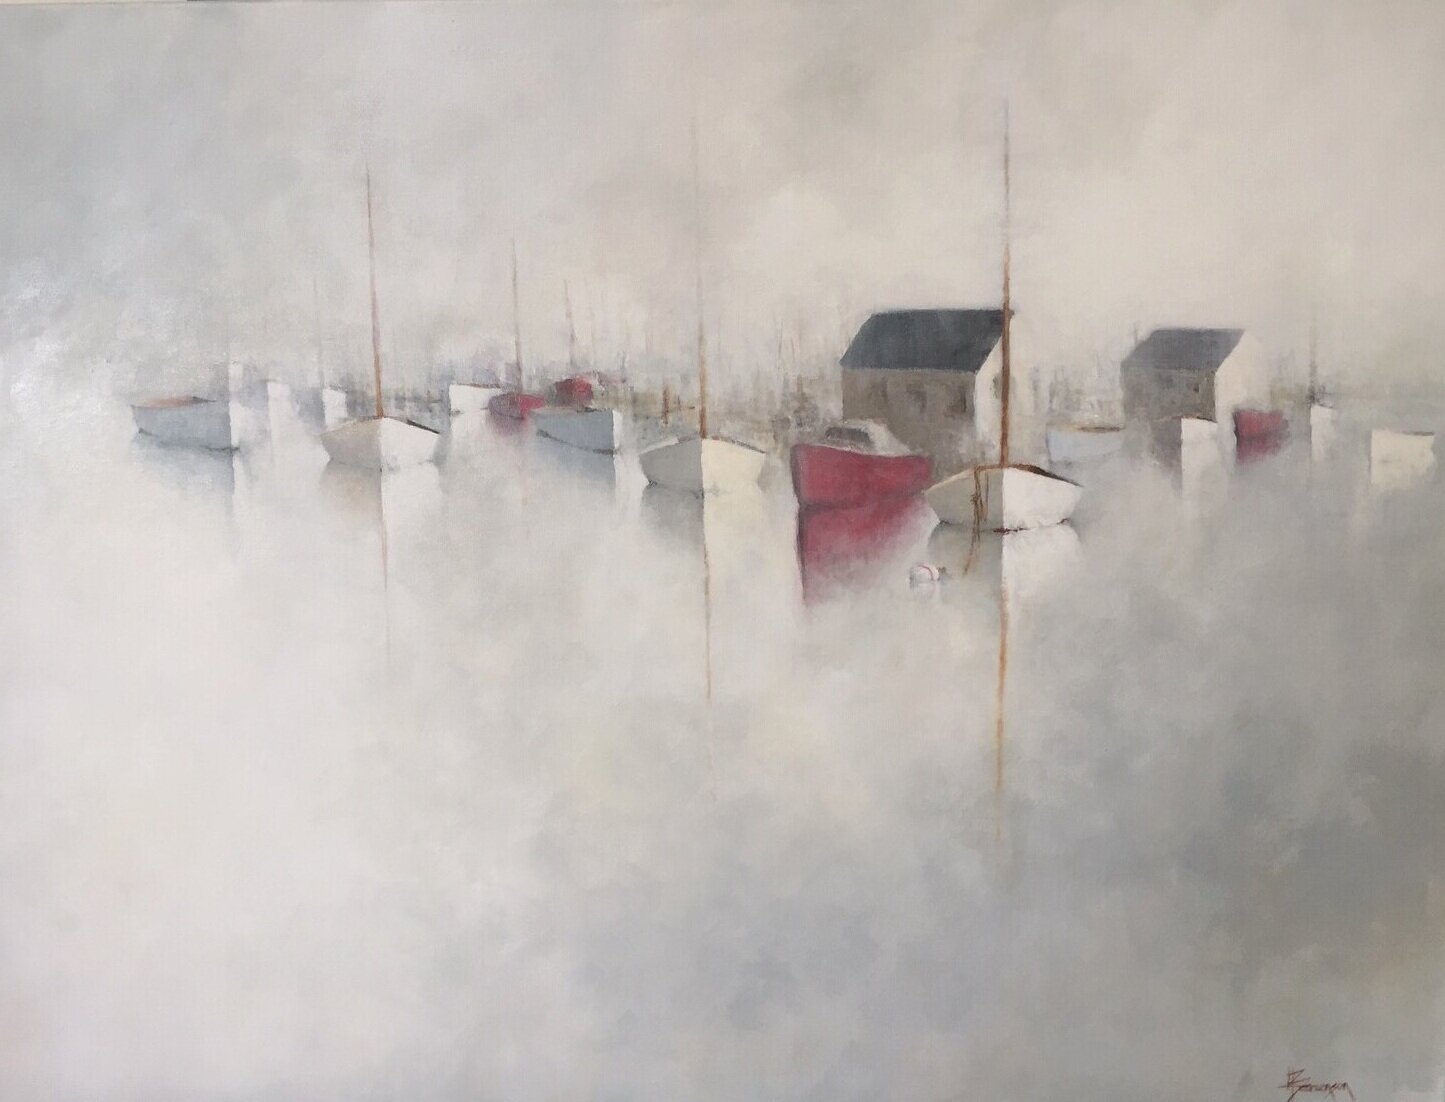 Silver Stillness, 40x30